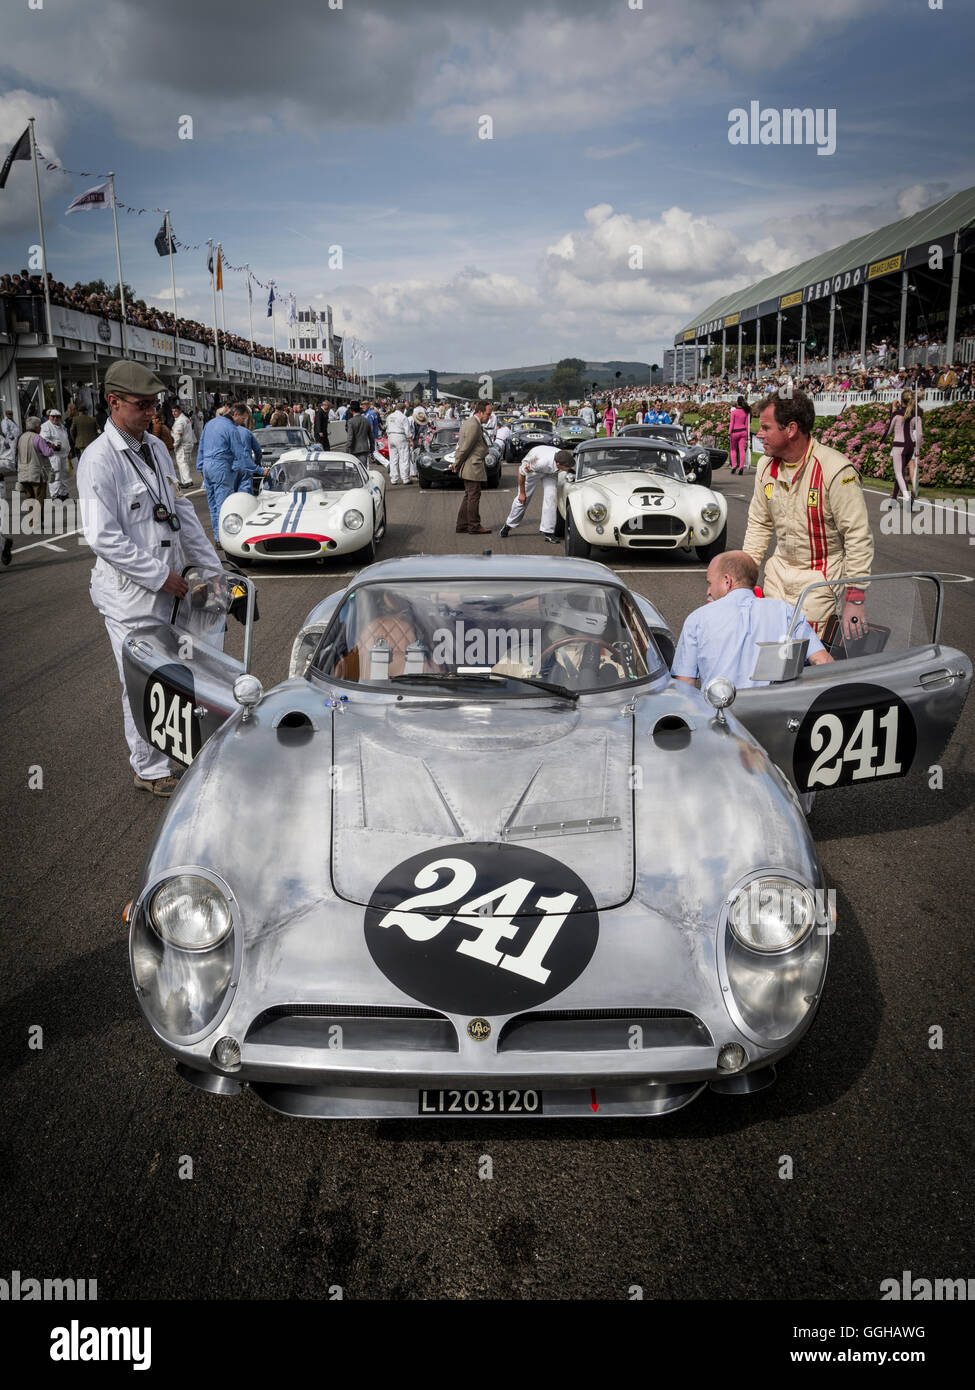 1964 ISO Bizzarini A3C, RAC TT Celebration, Goodwood Revival 2014, Racing Sport, Classic Car, Goodwood, Chichester, - Stock Image